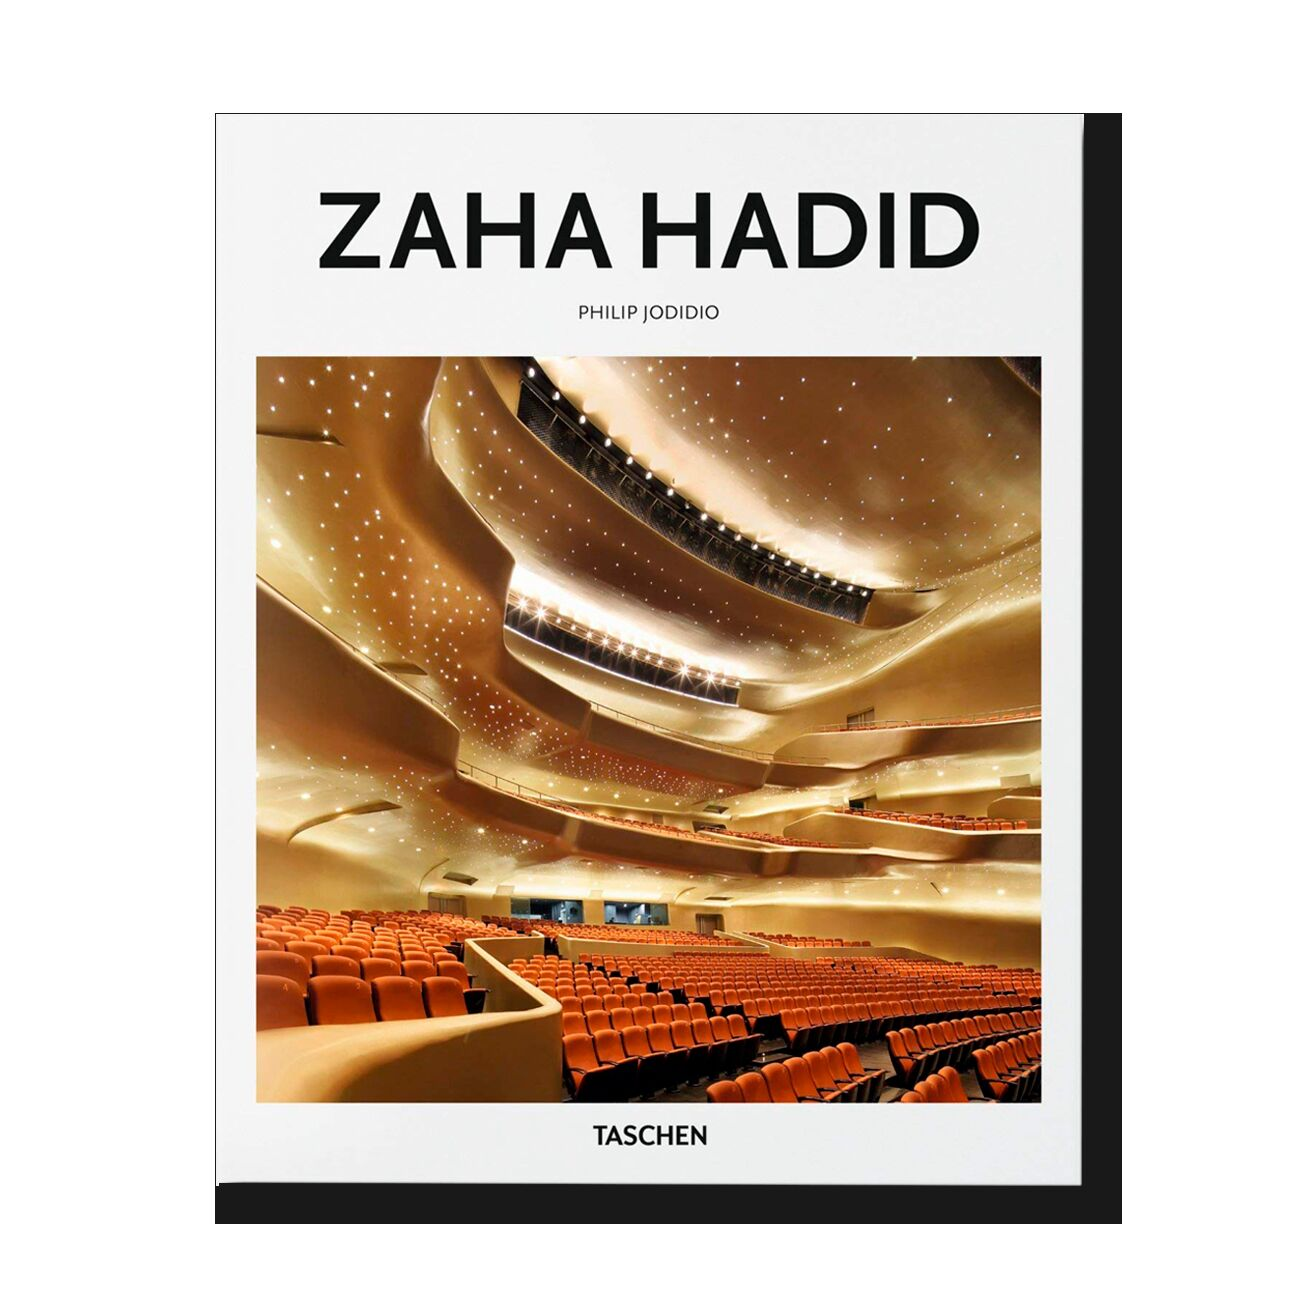 Zaha Hadid (Basic Art Series)